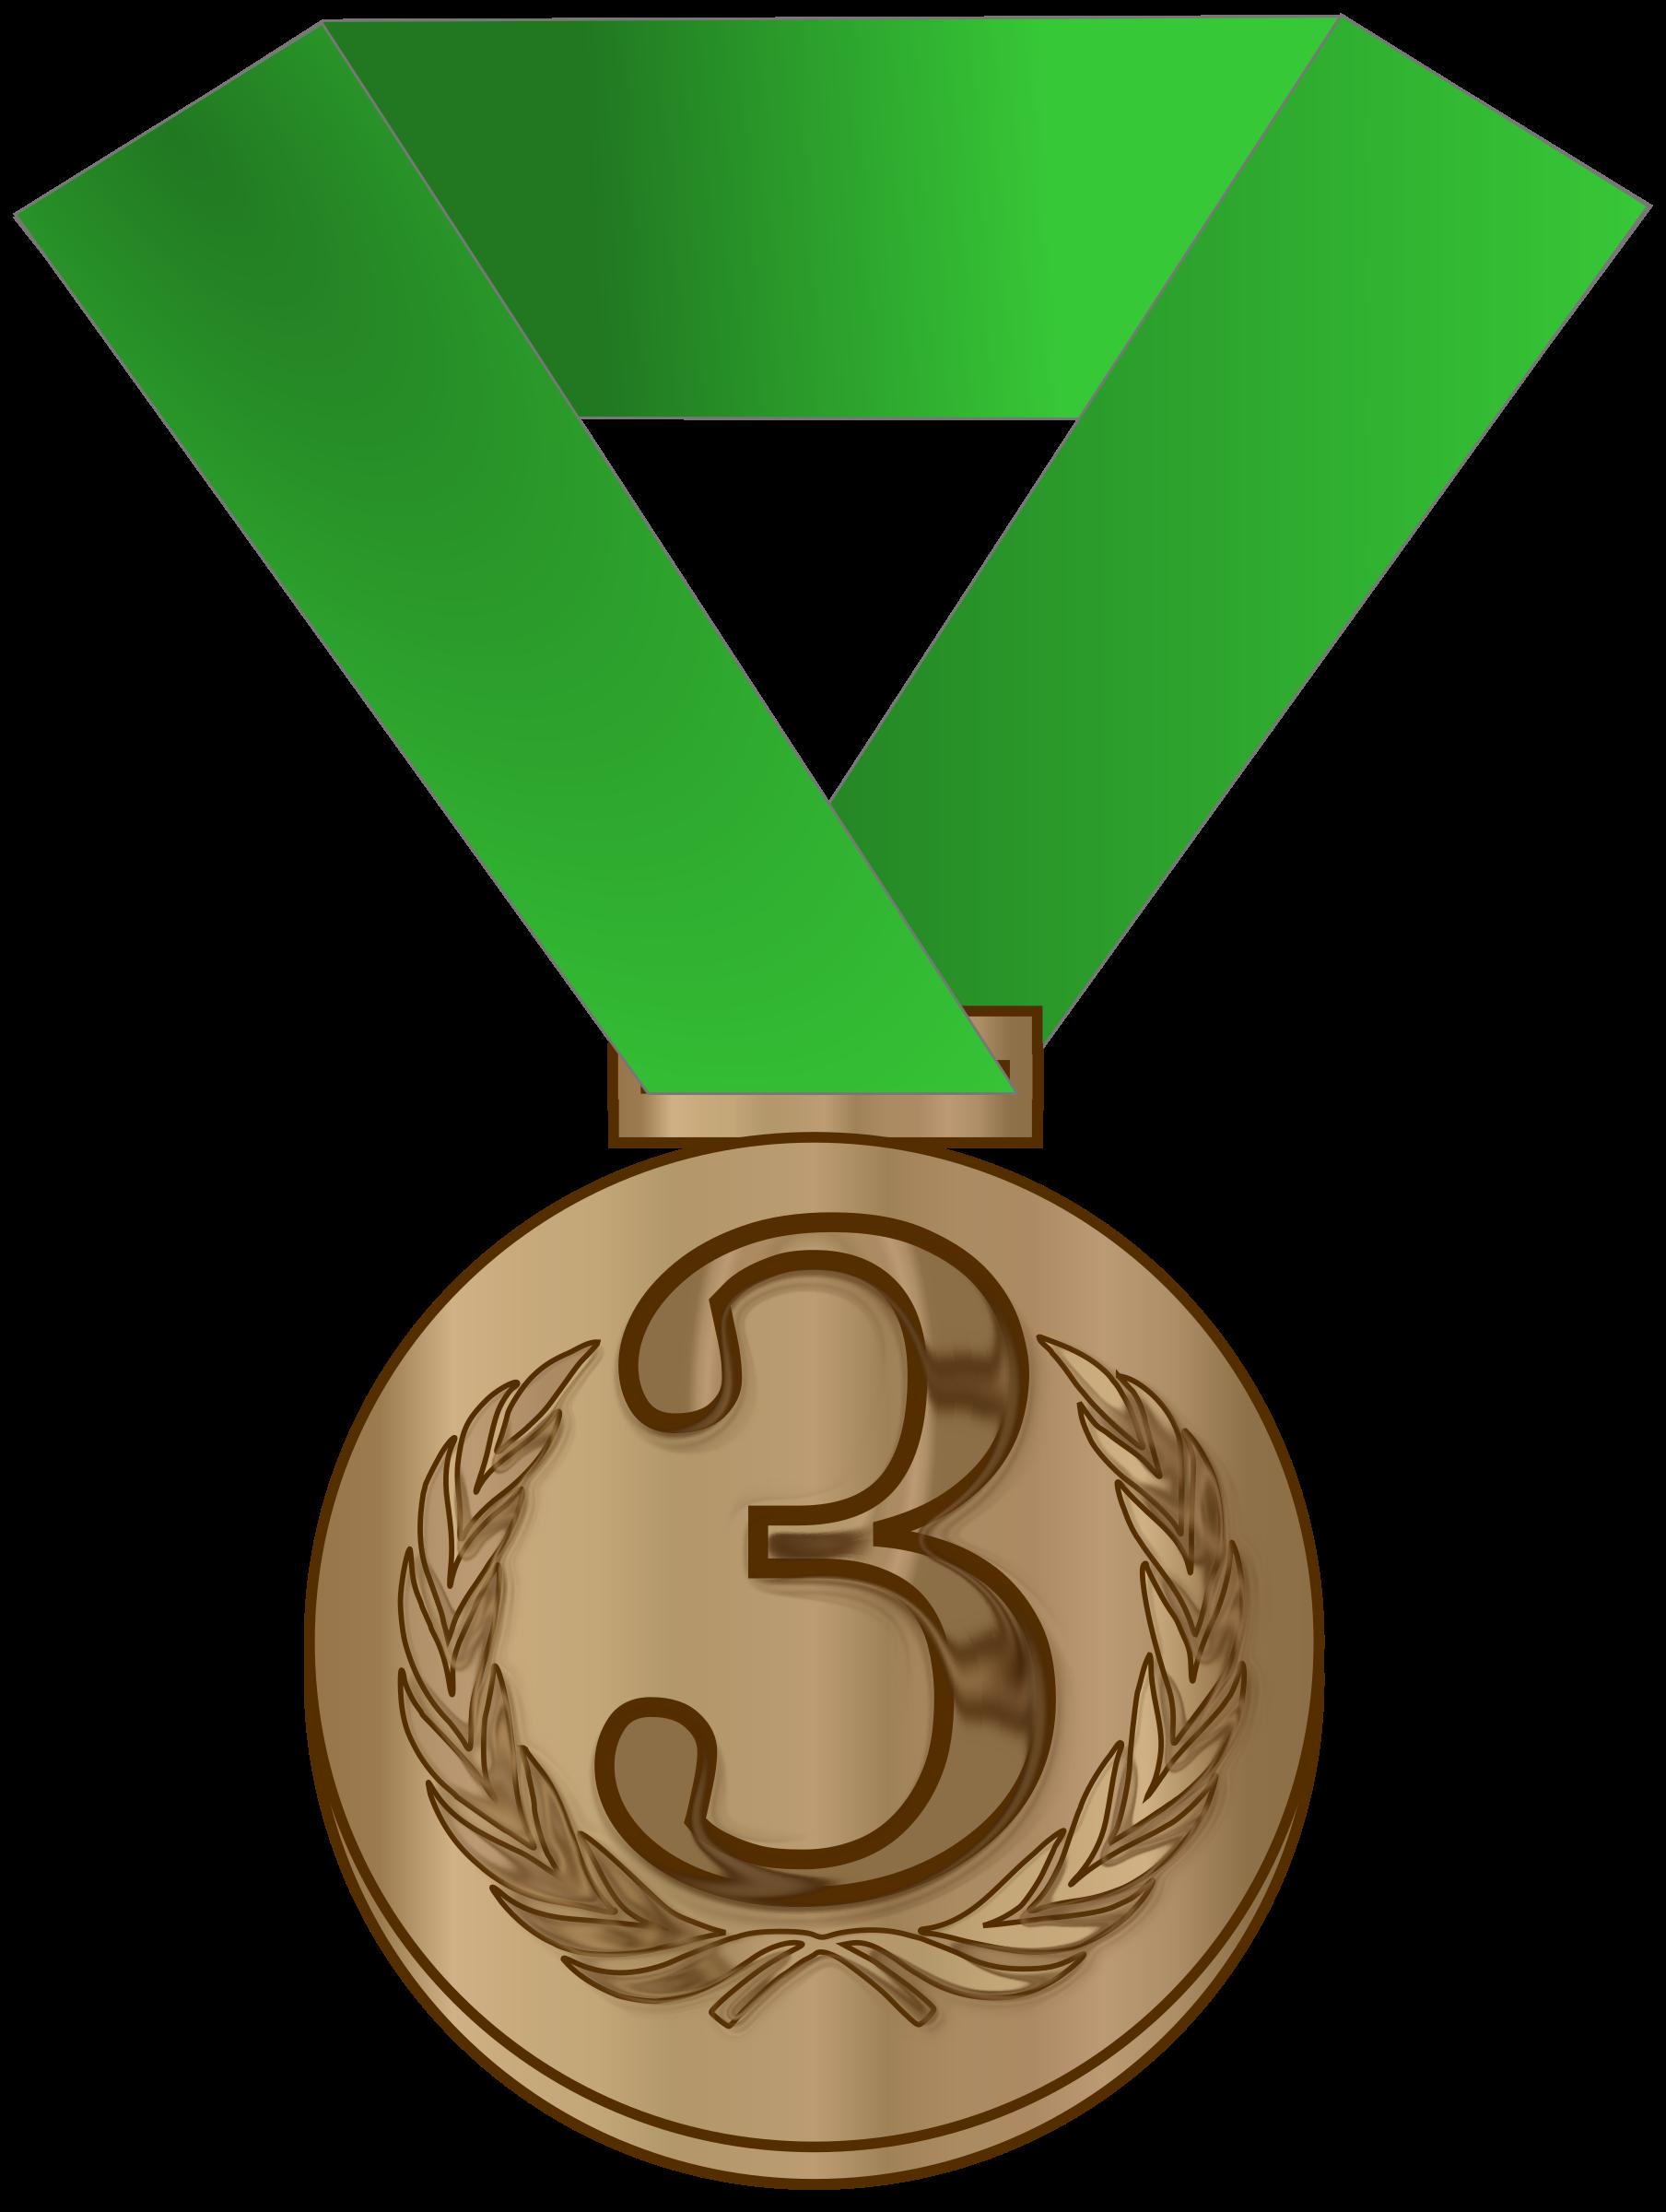 Award big image png. Medal clipart bronze